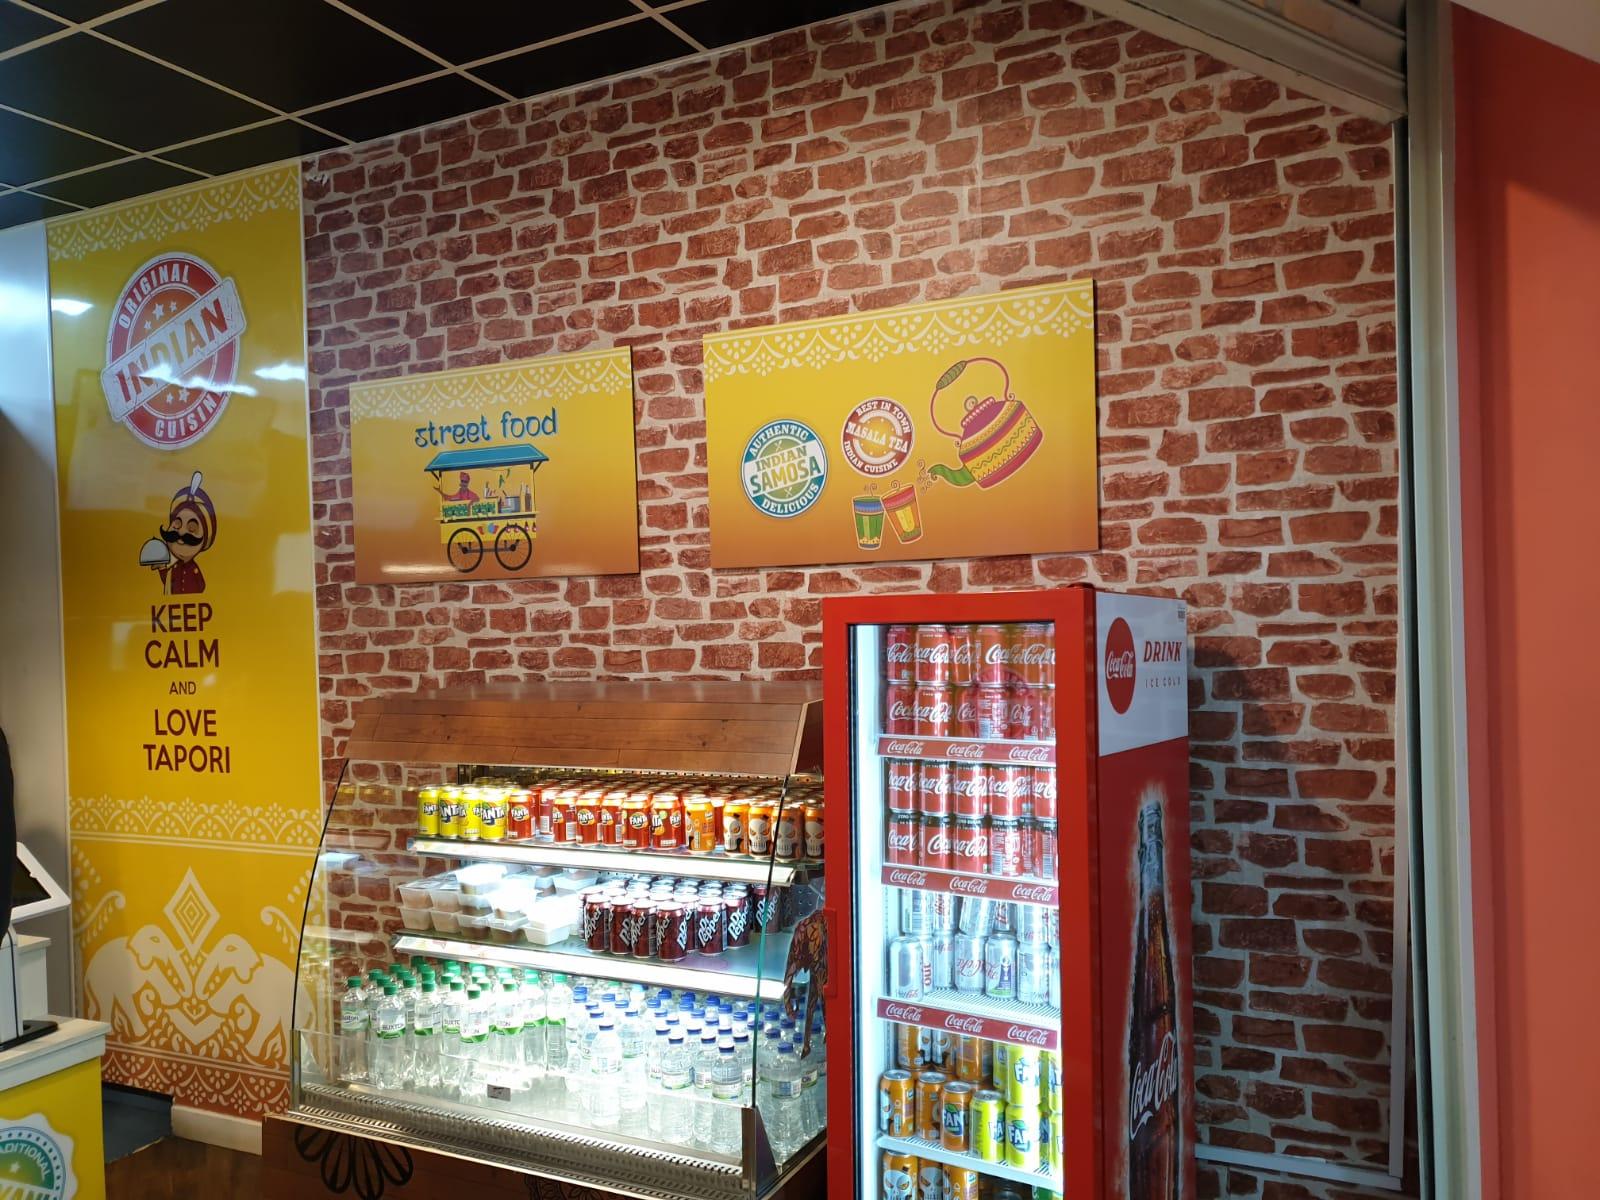 Restaurant graphics and signage